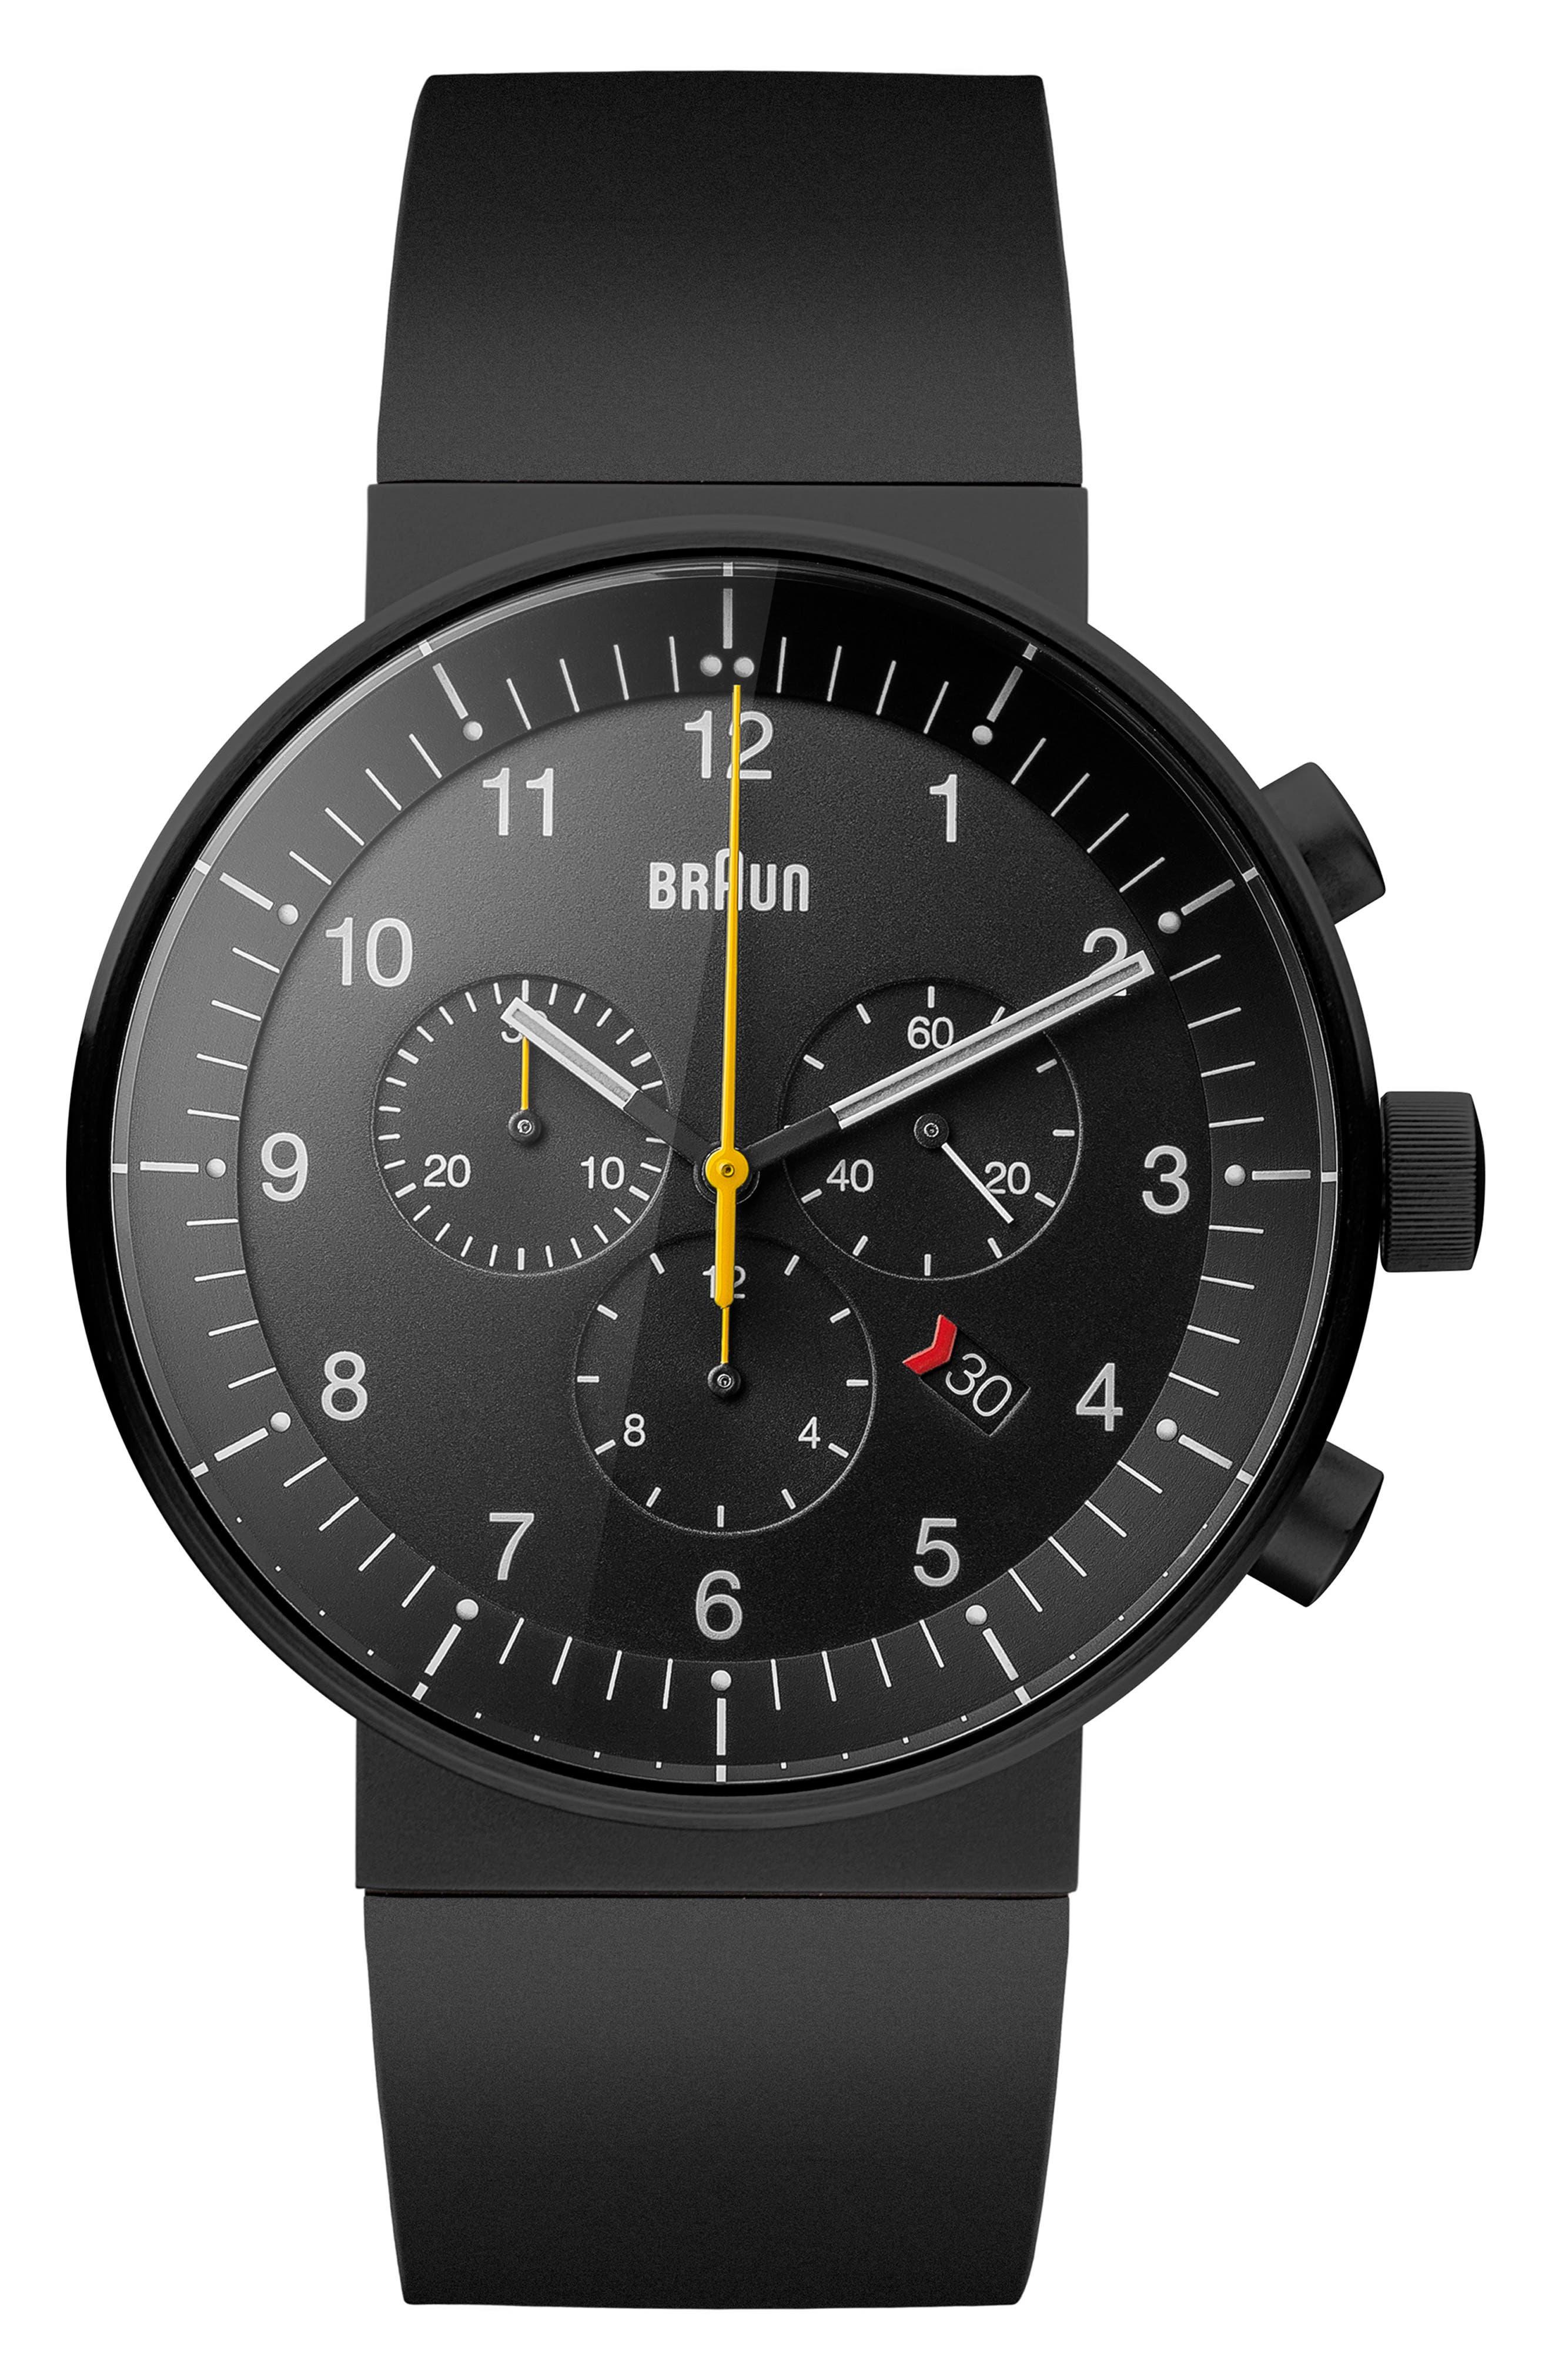 BRAUN Prestige Chronograph Leather Strap Watch, 43Mm in Black